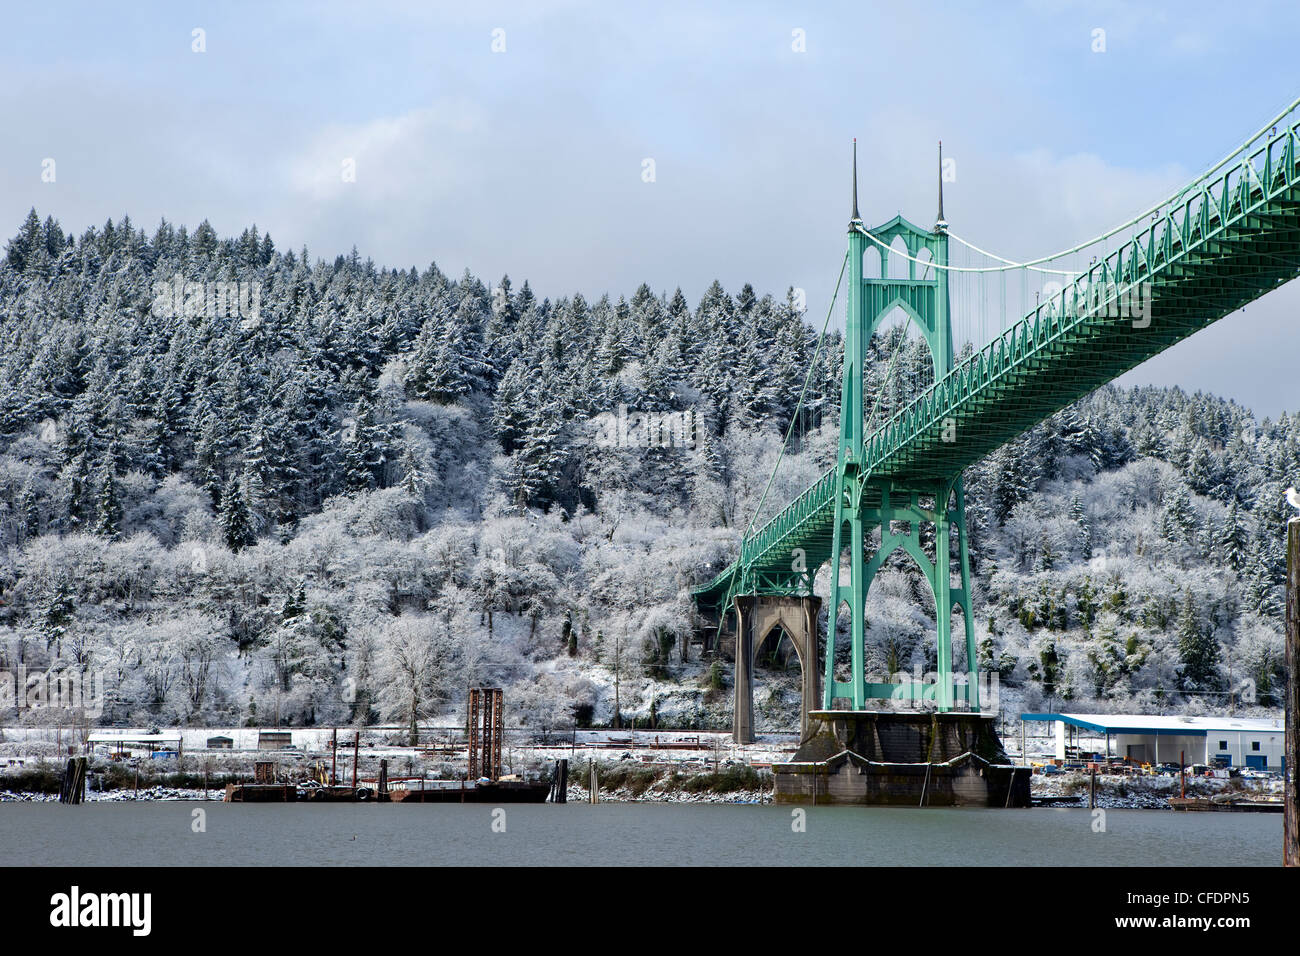 A bridge in Portland Oregon. - Stock Image